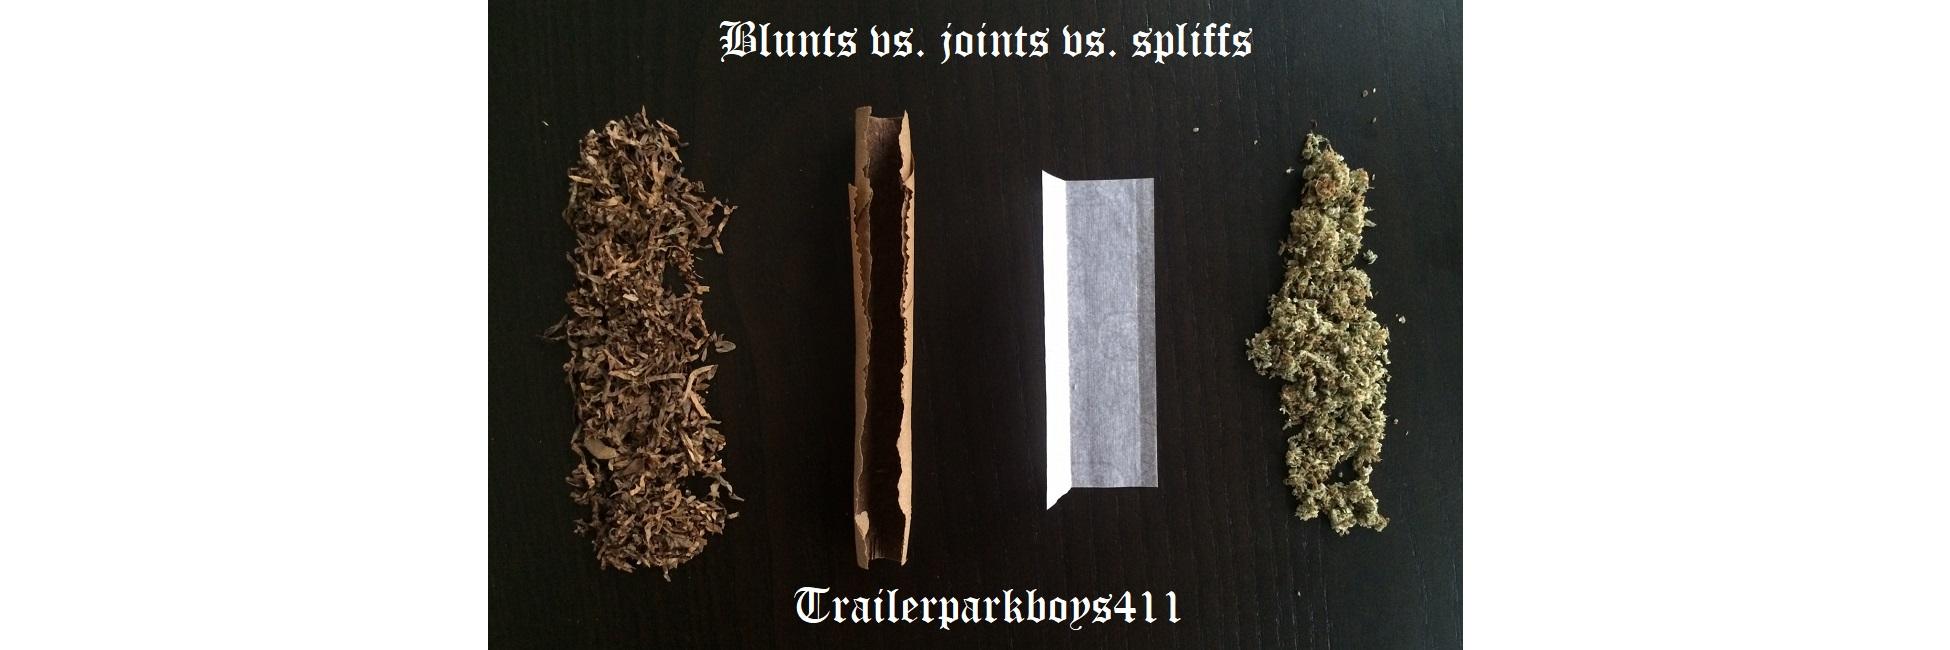 Blunts vs. joints vs. spliffs